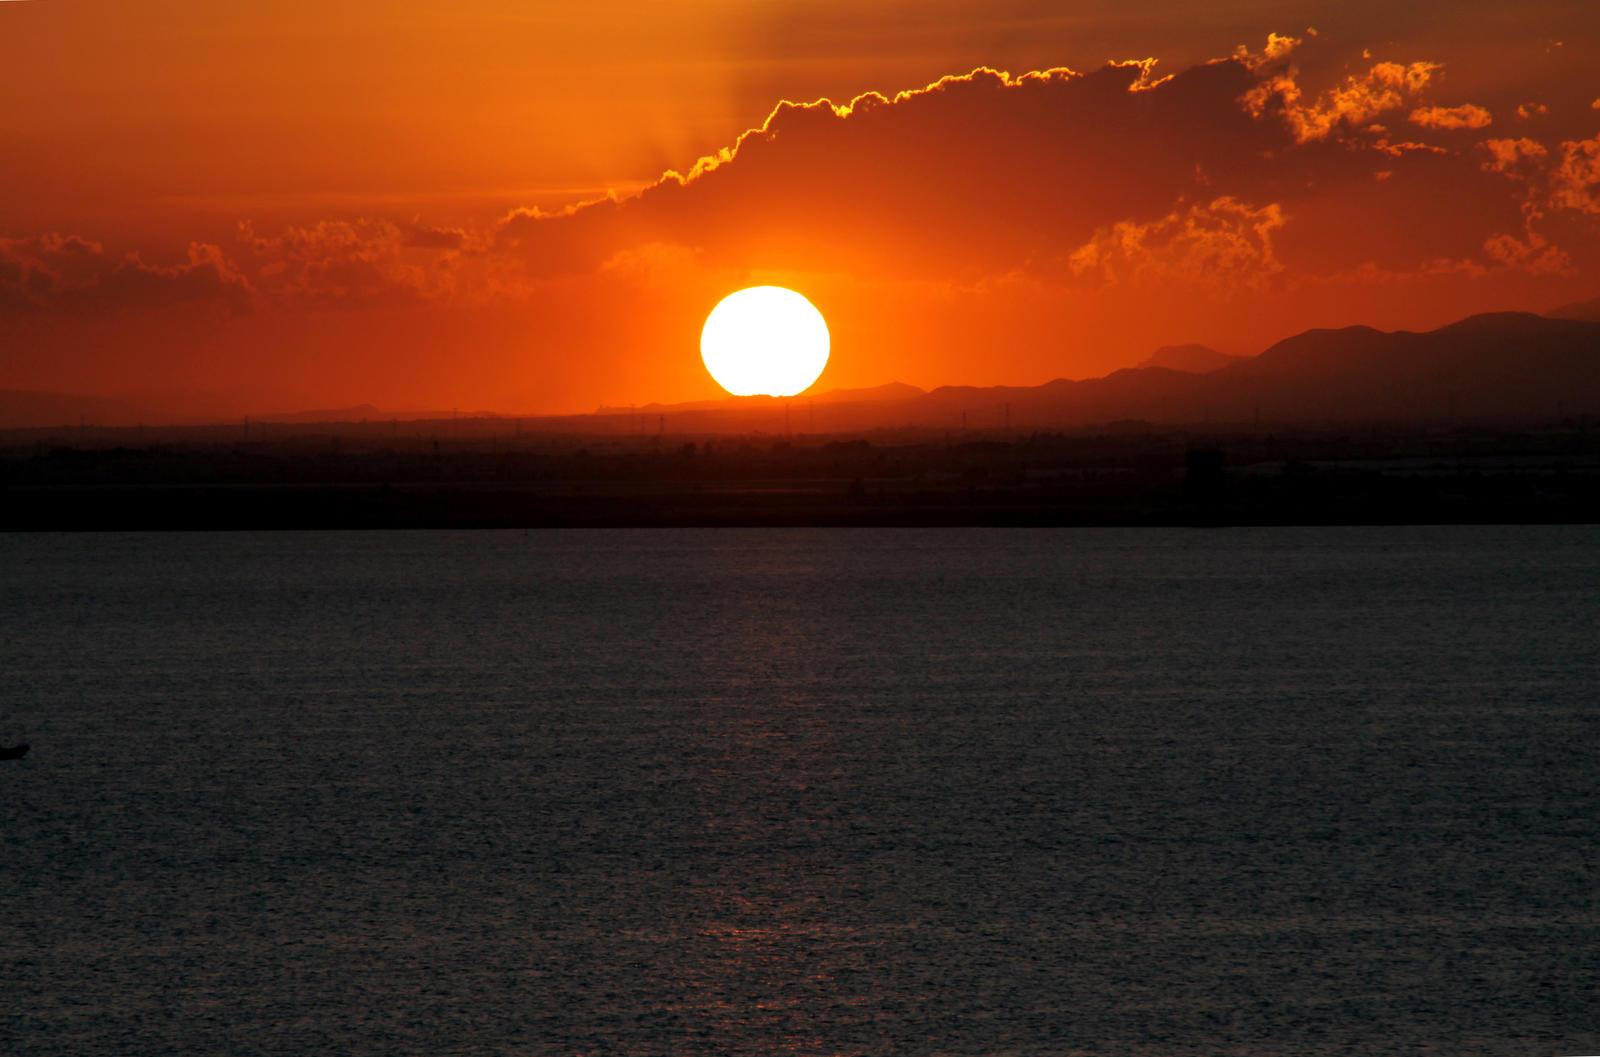 Sunset at La Manga 03 by Datasmurf